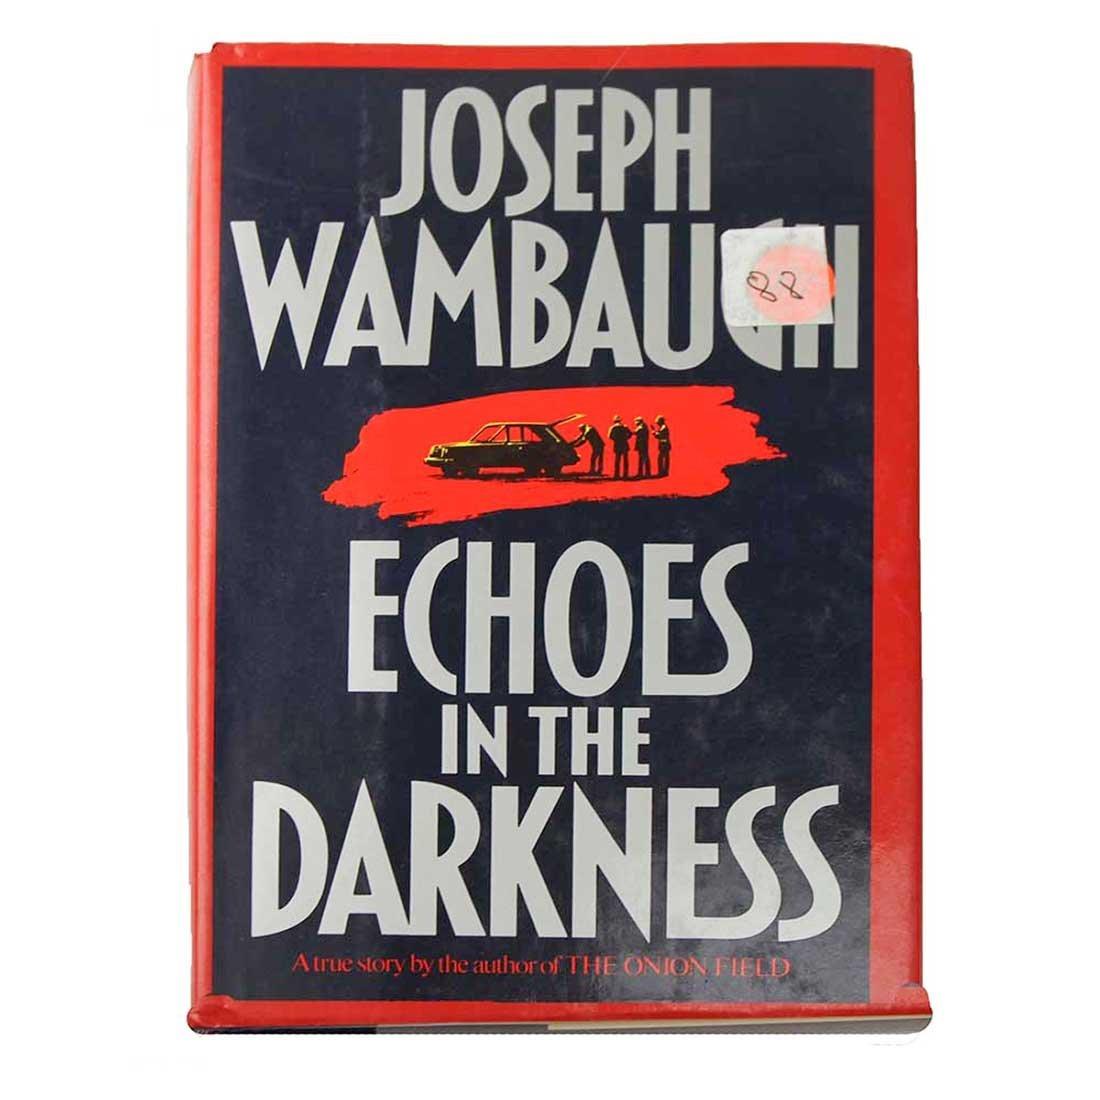 Joseph Wambaugh Autographed Book